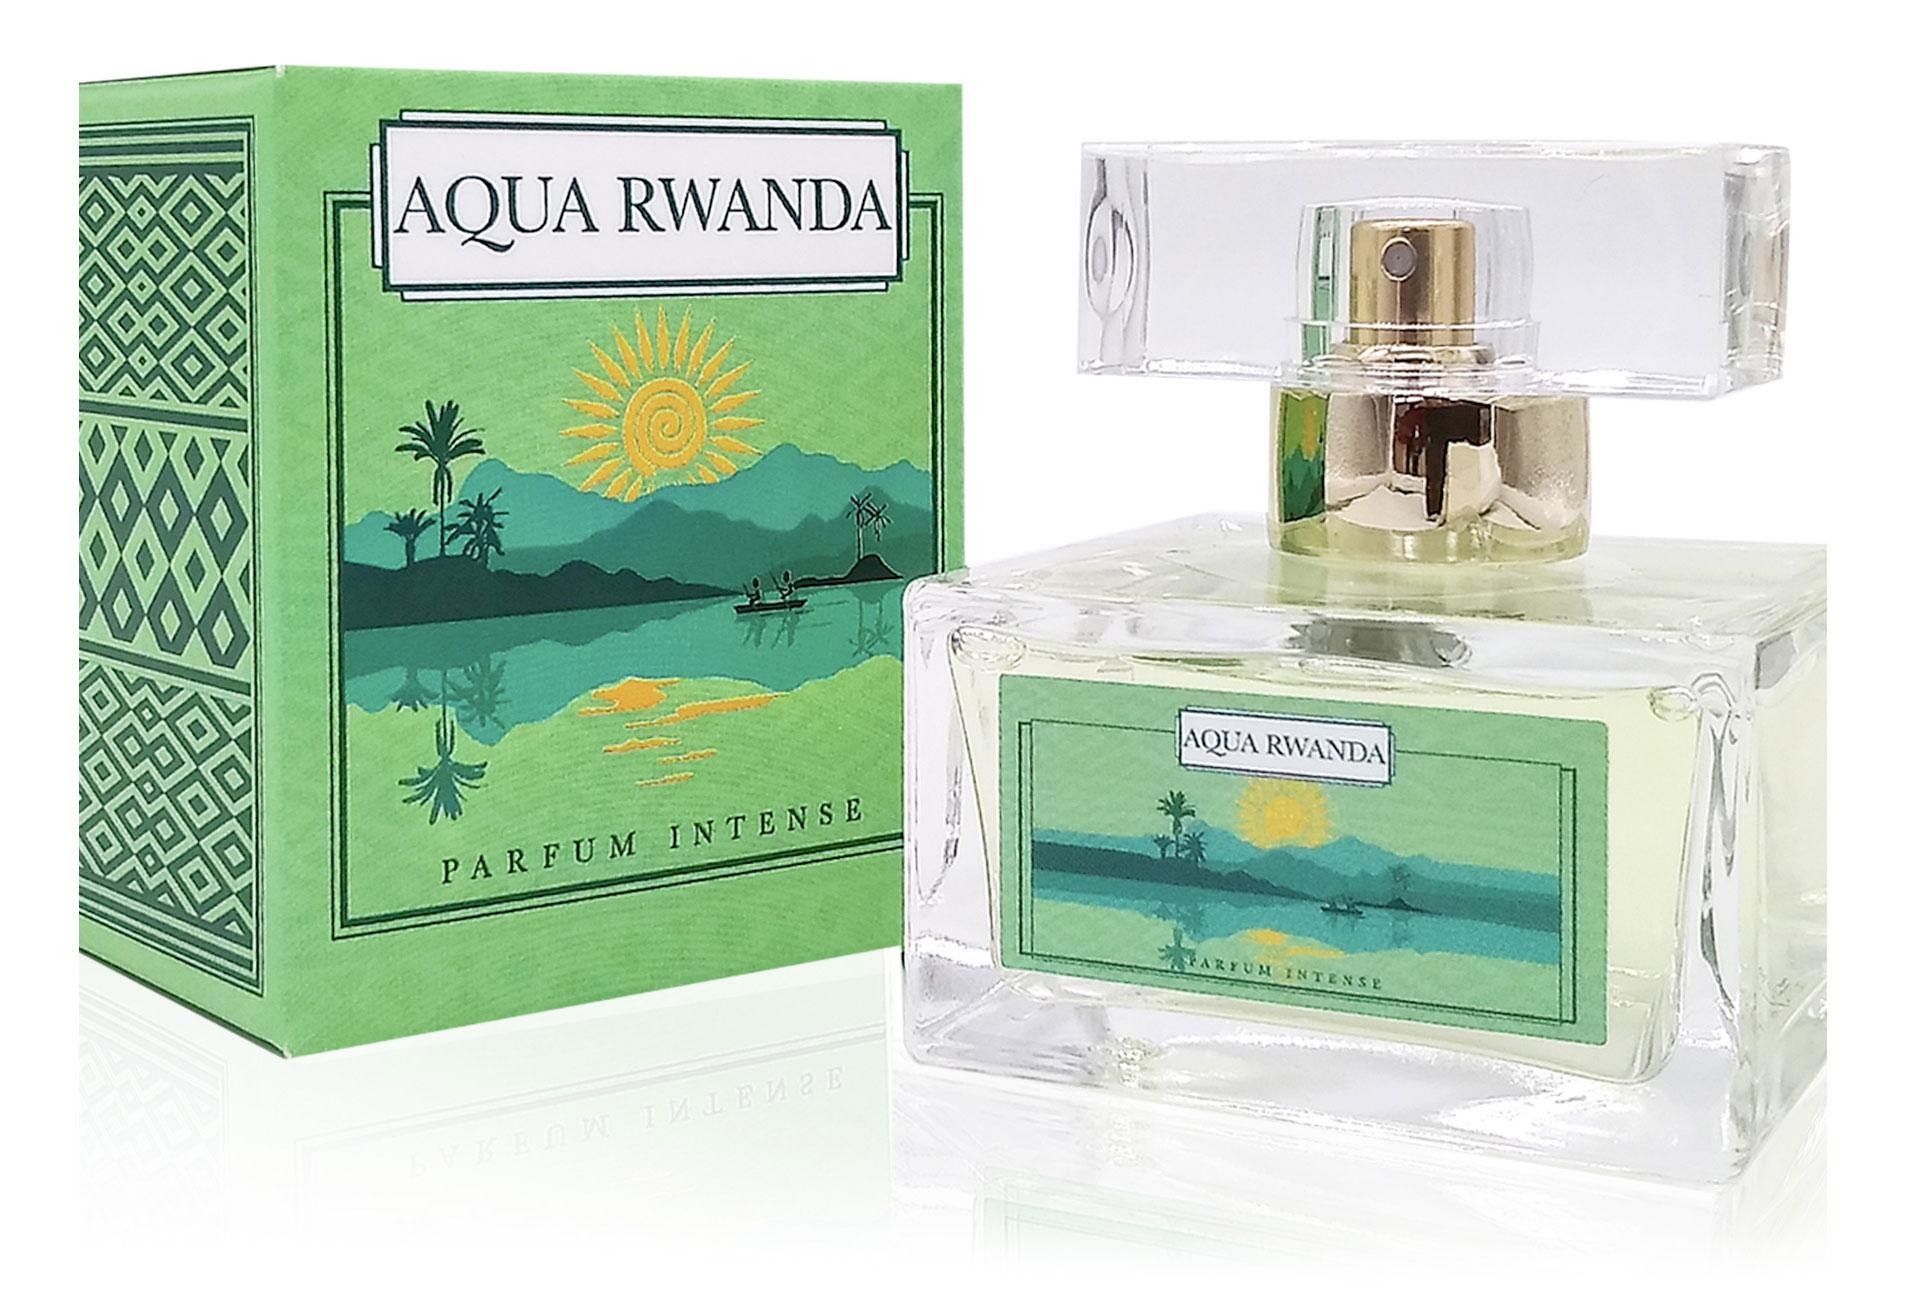 Aqua Rwanda Parfum Intense flacon and box